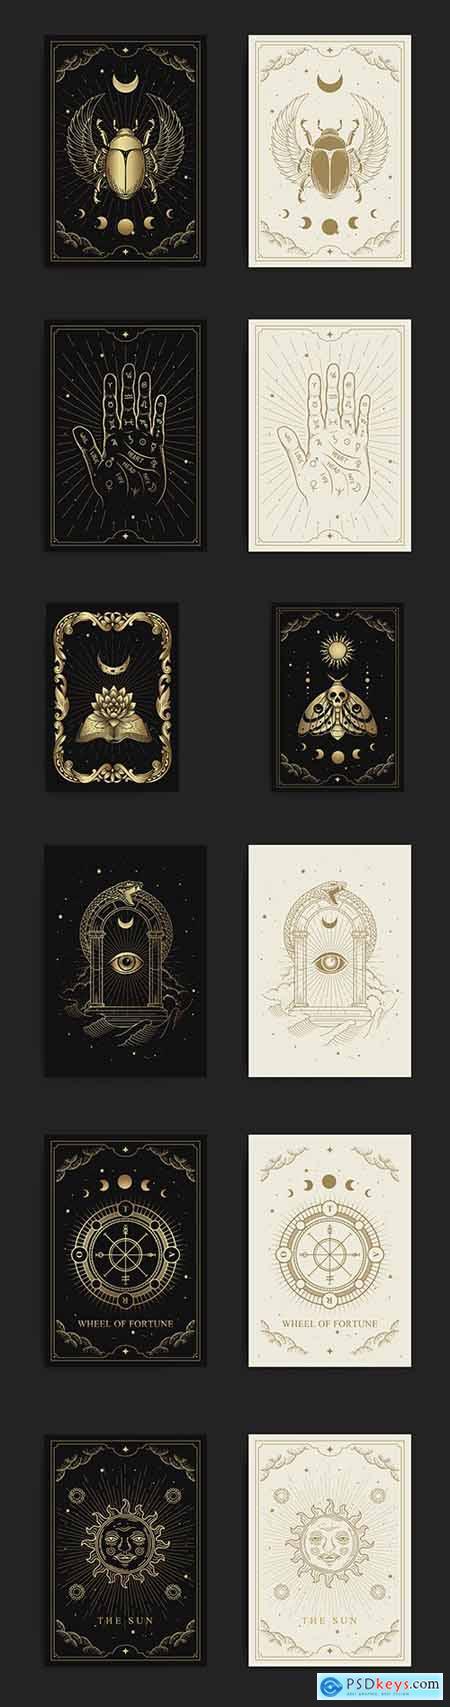 Esoteric boho style design paranormal astrologer phenomena